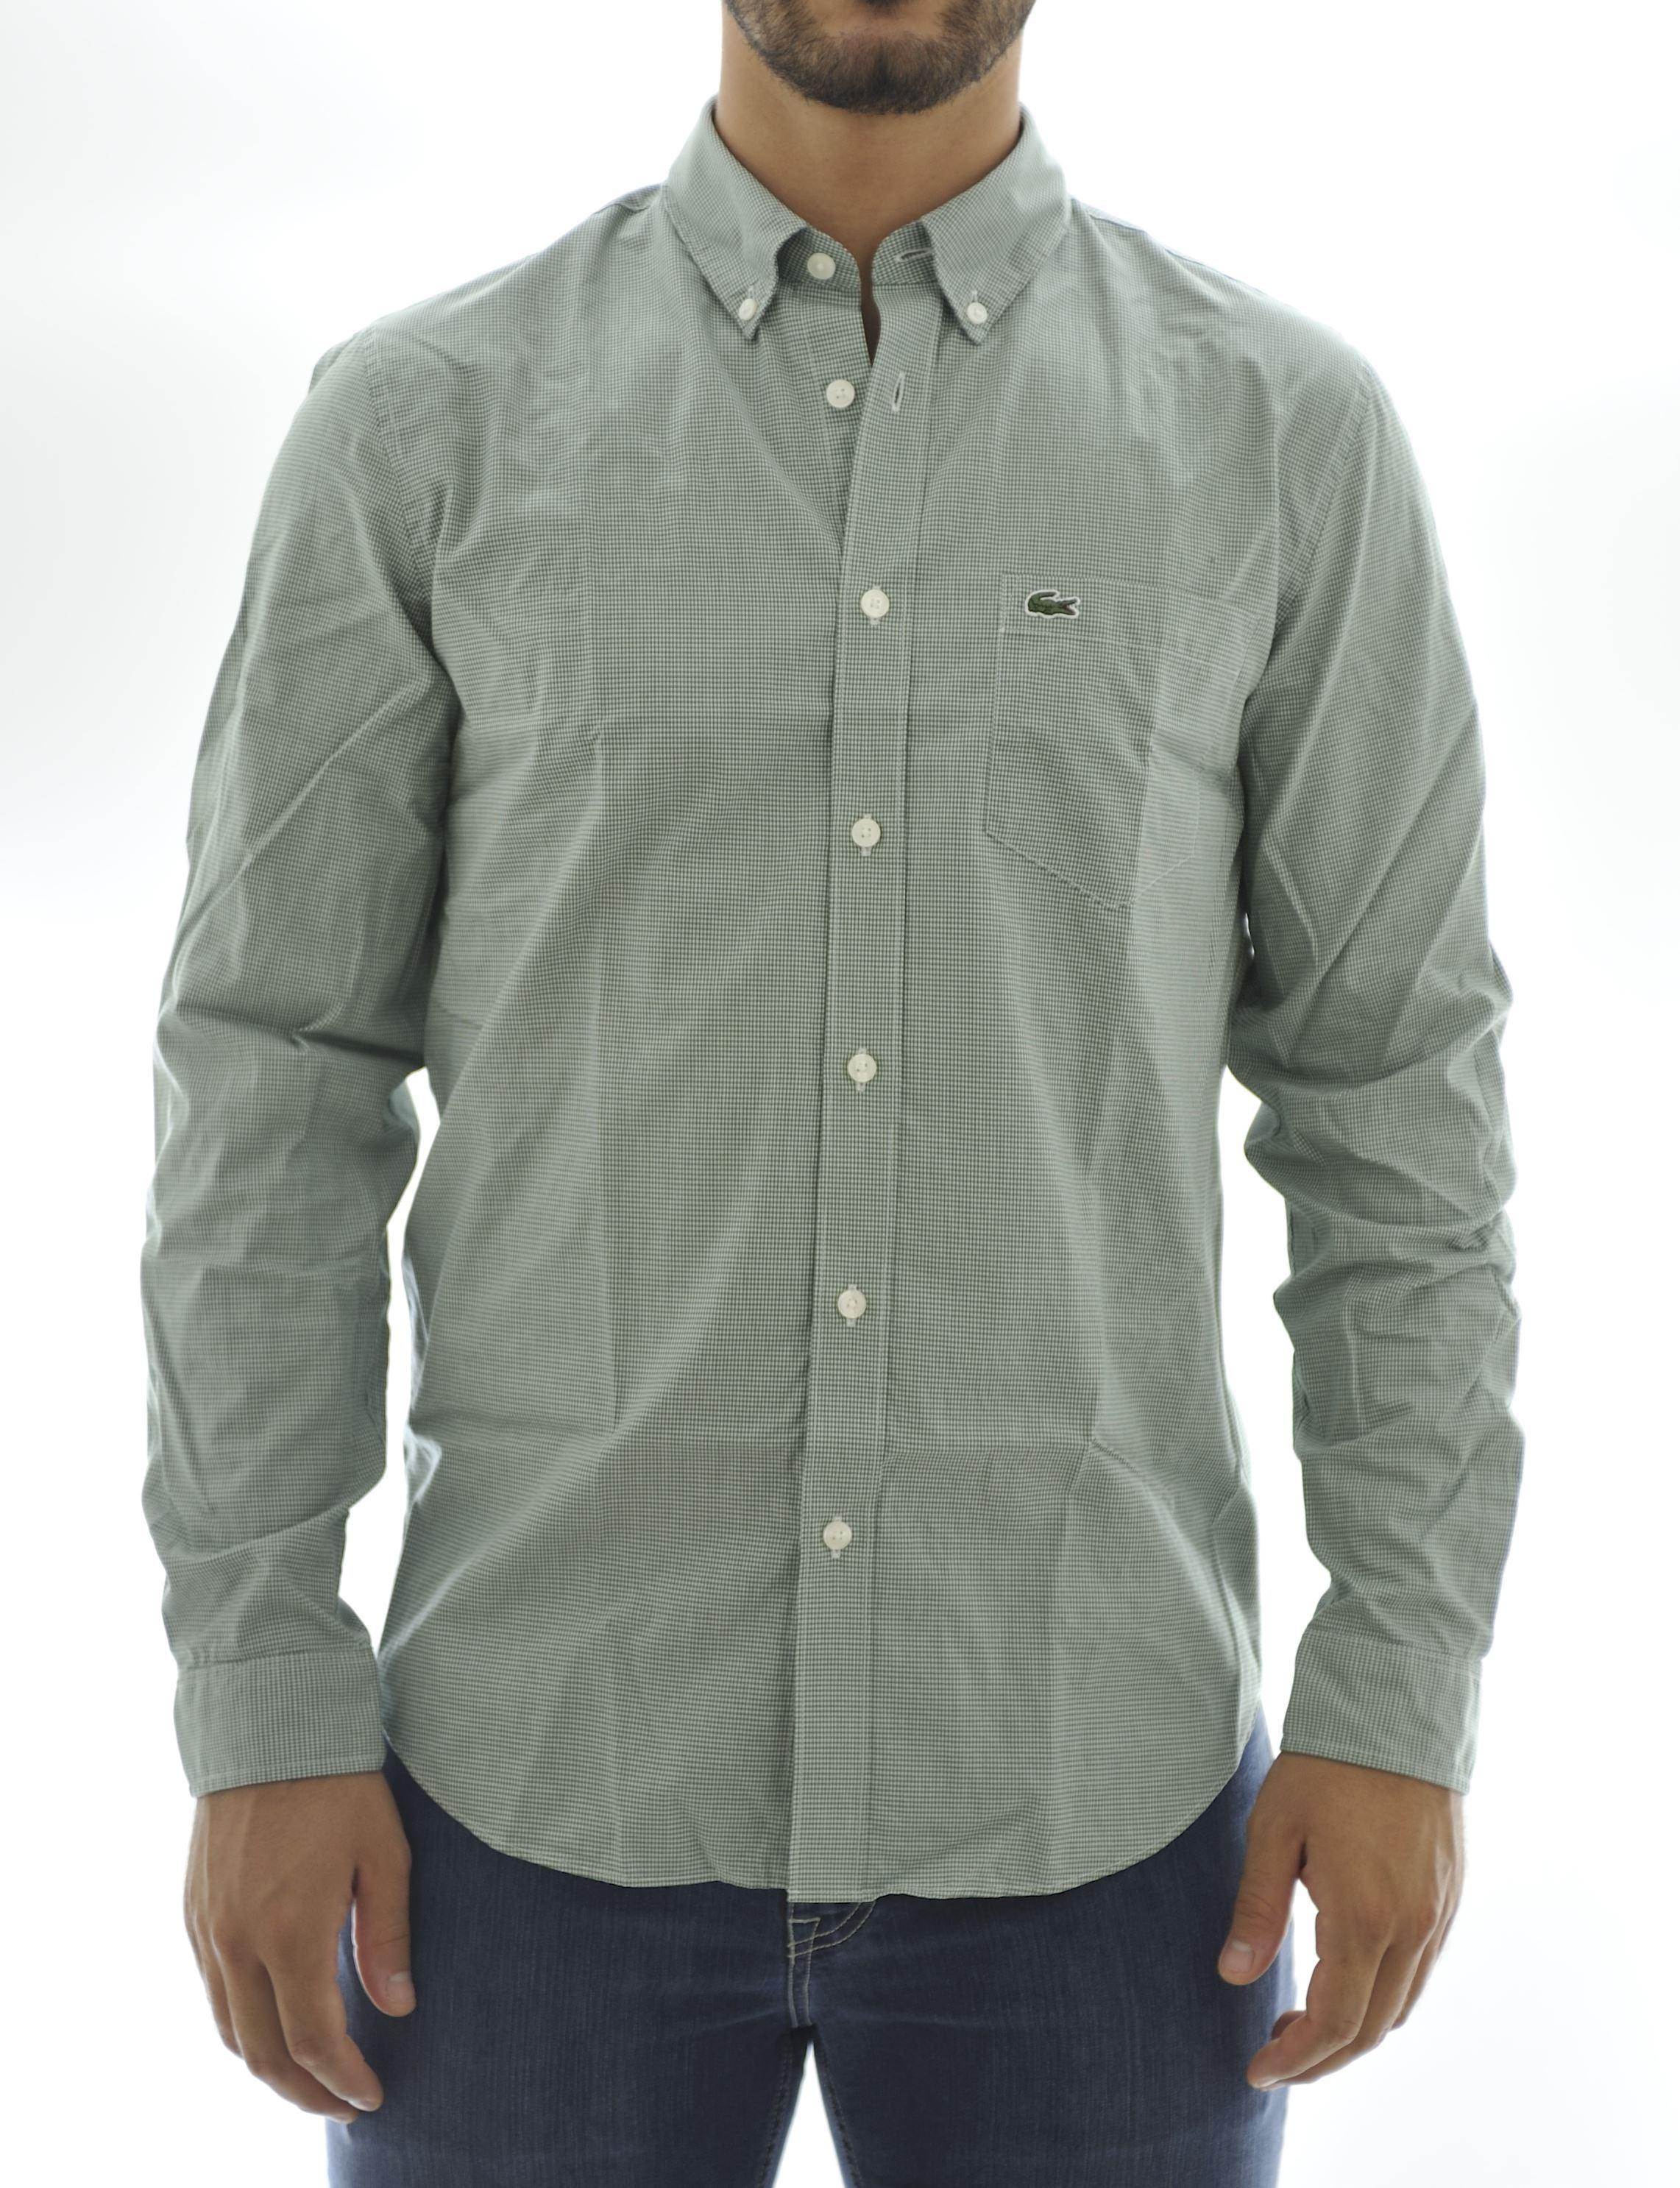 Immagine di Camicia manica lunga fondo verde